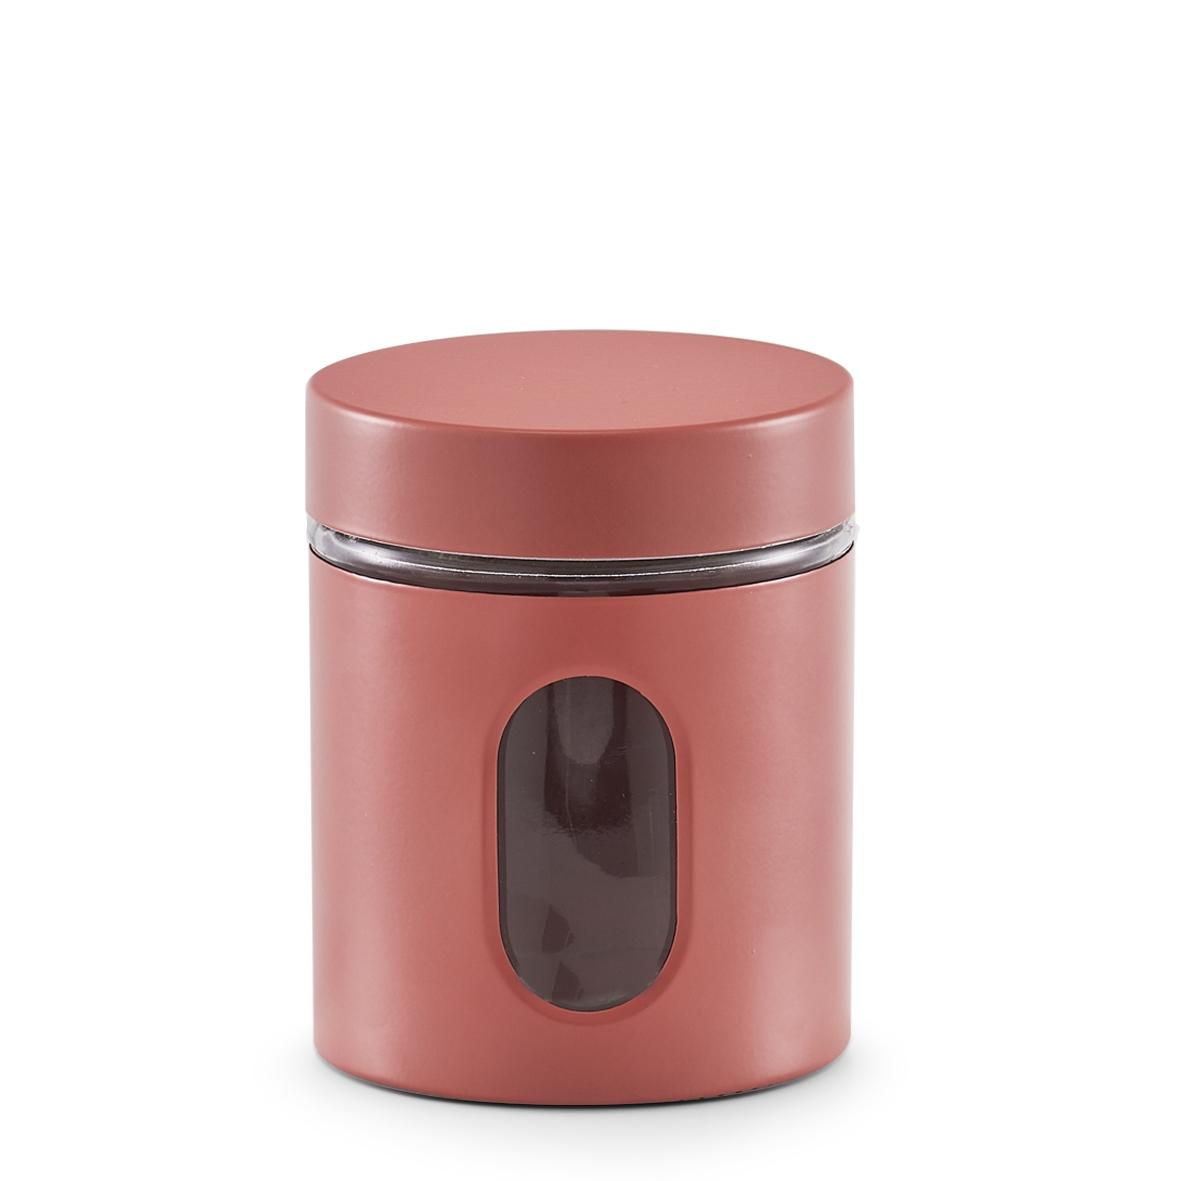 Recipient pentru depozitare Visual, metal si sticla, Coral 600 ml, Ø10,2xH12,5 cm